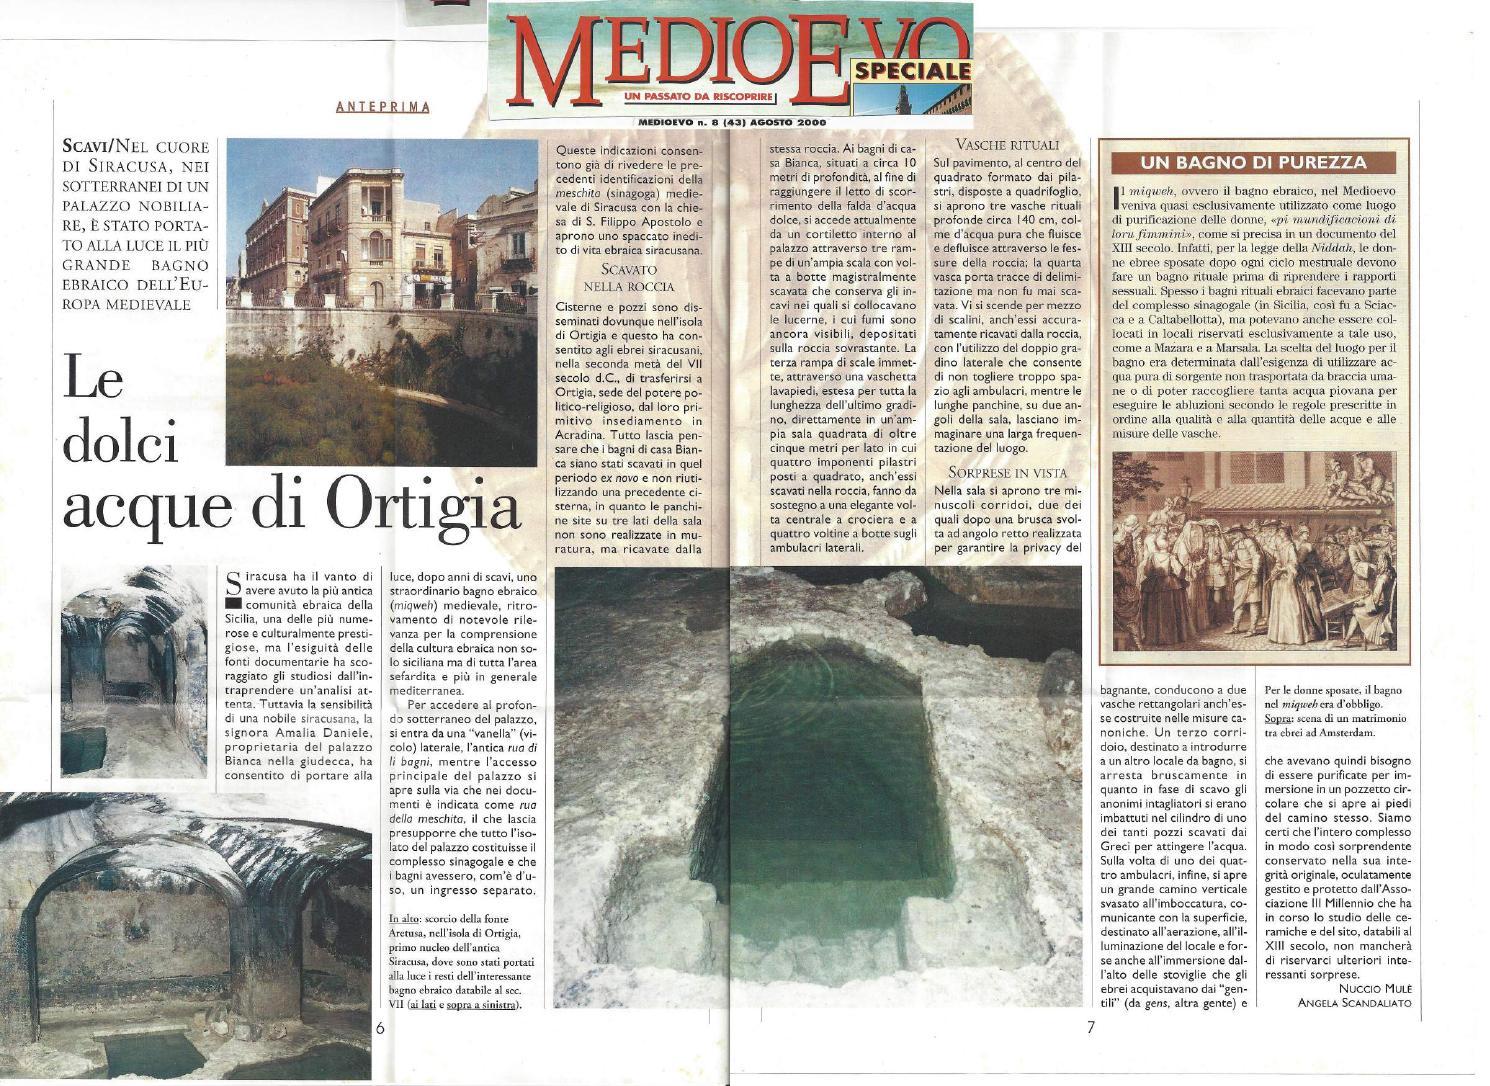 Medioevo%20agosto2000 025 compressed by bagno ebraico siracusa issuu